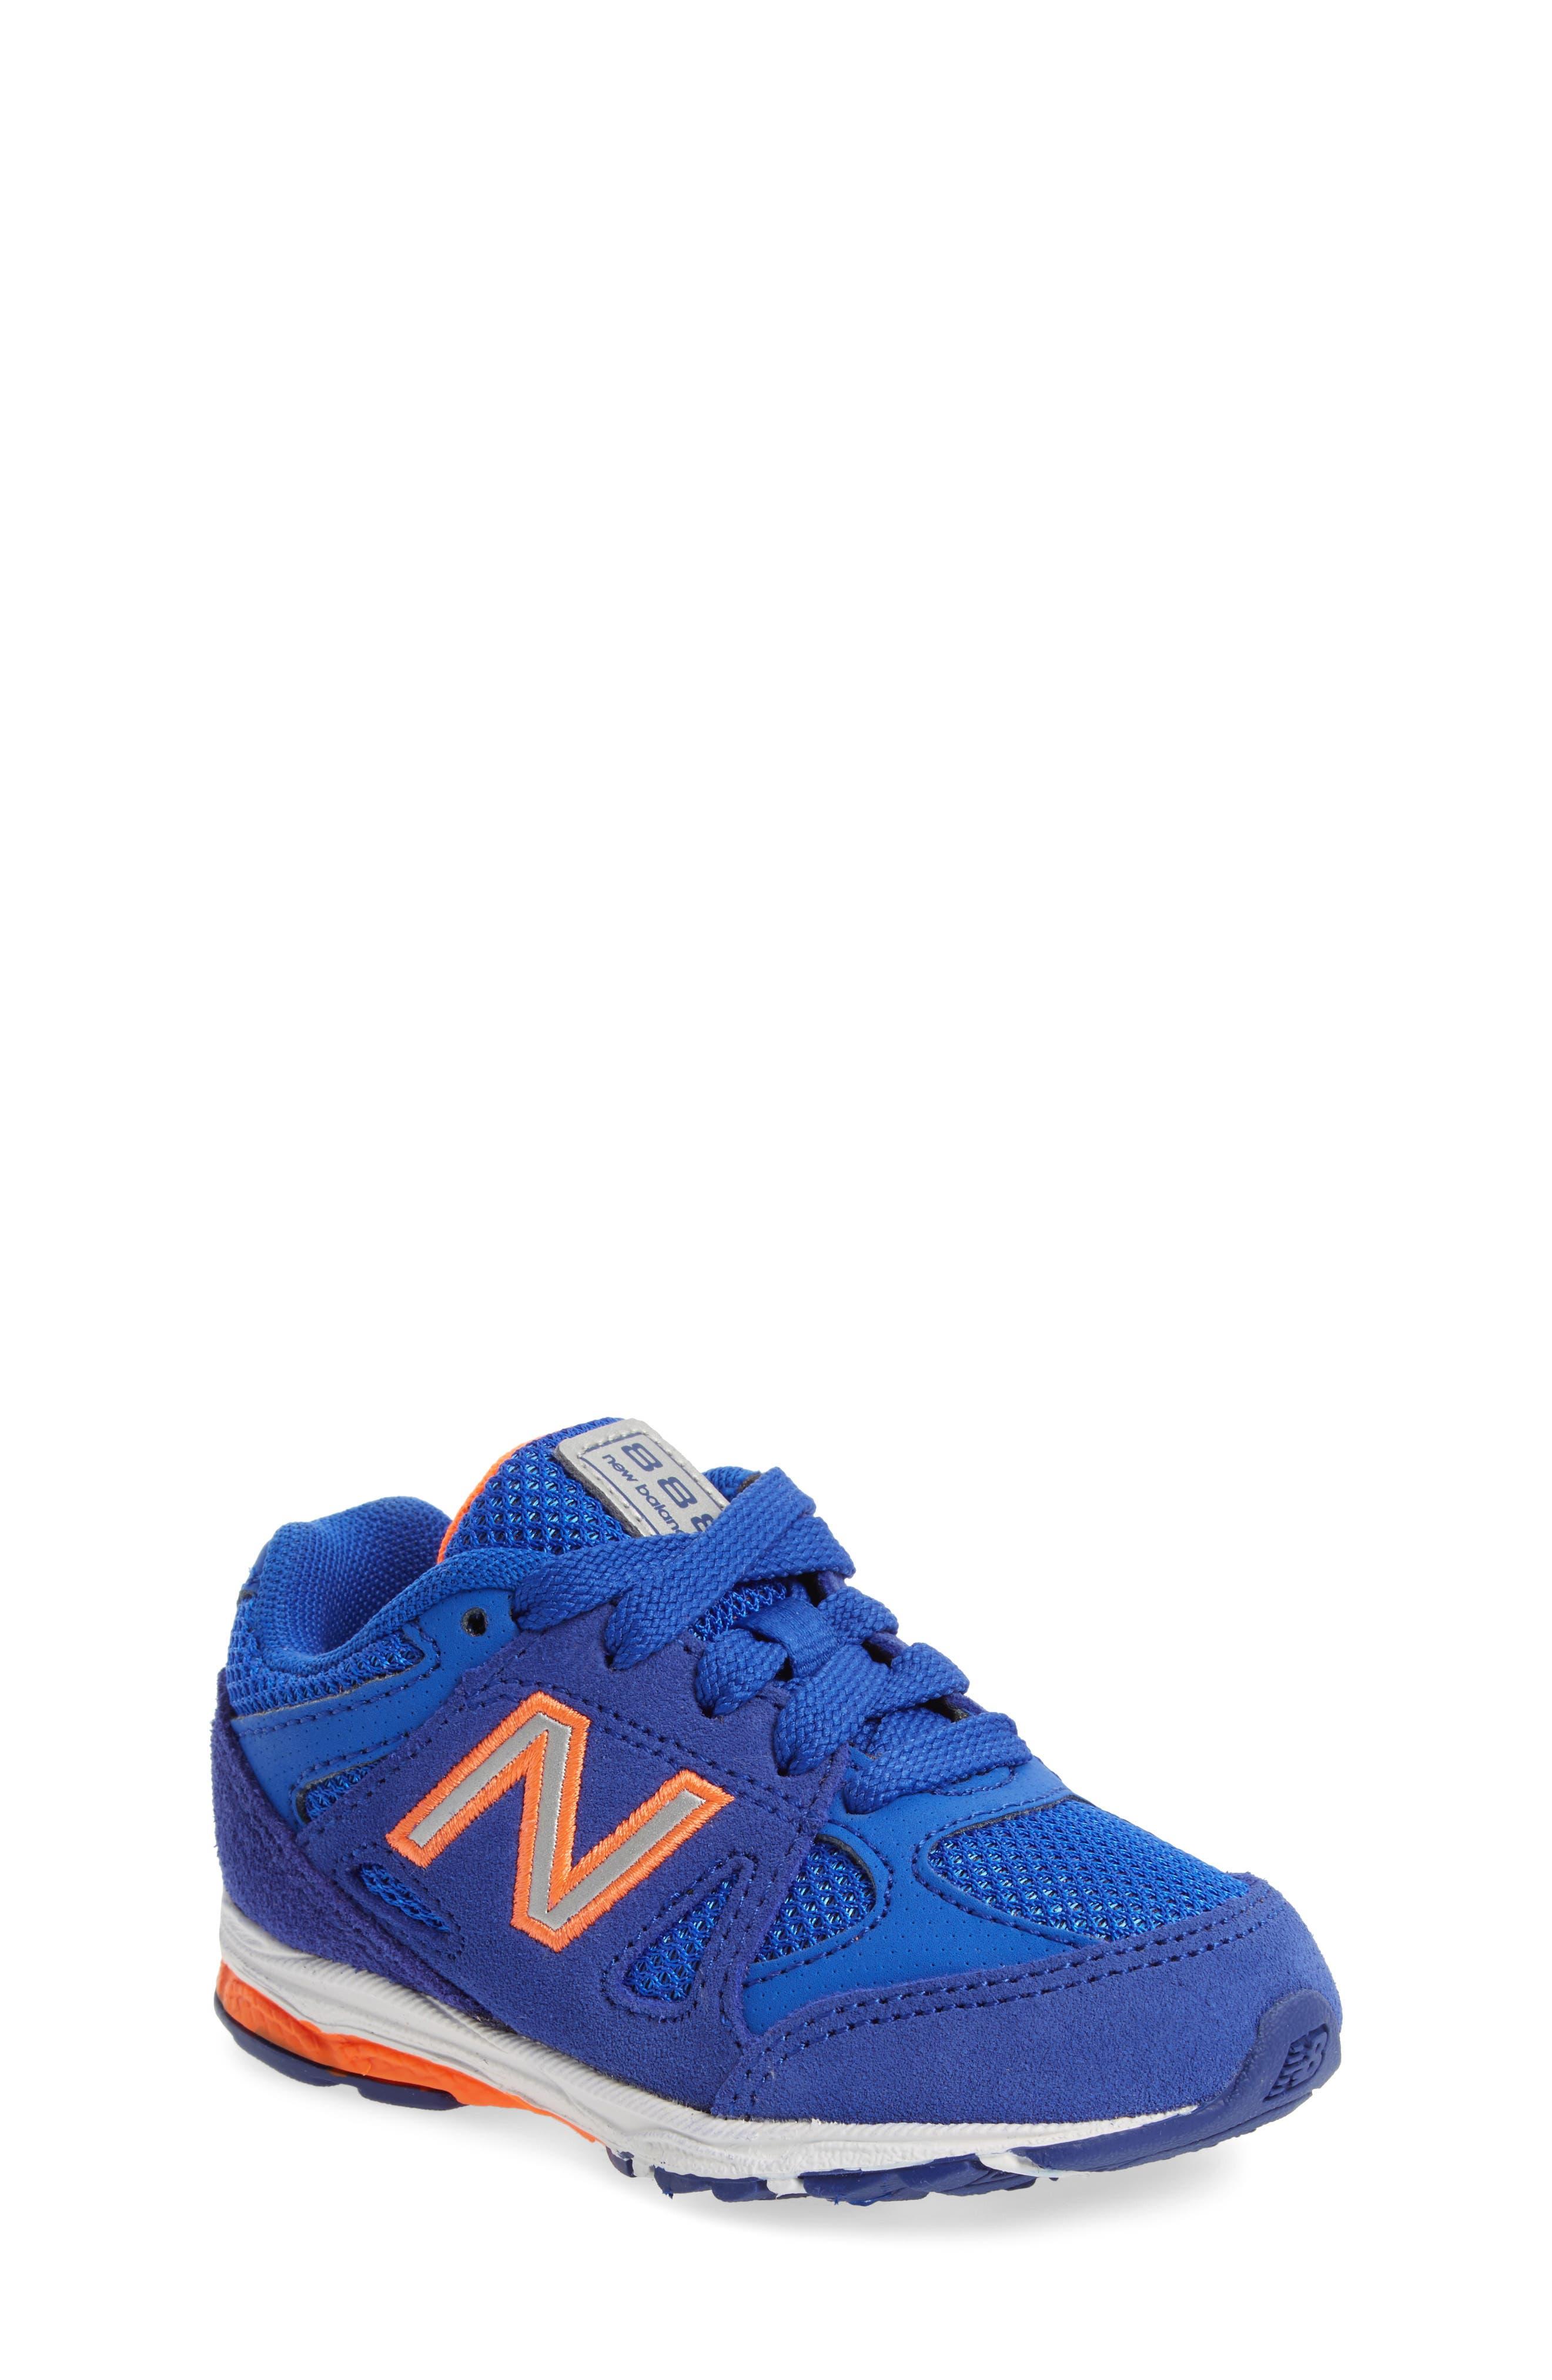 888 Sneaker,                         Main,                         color, Pacific